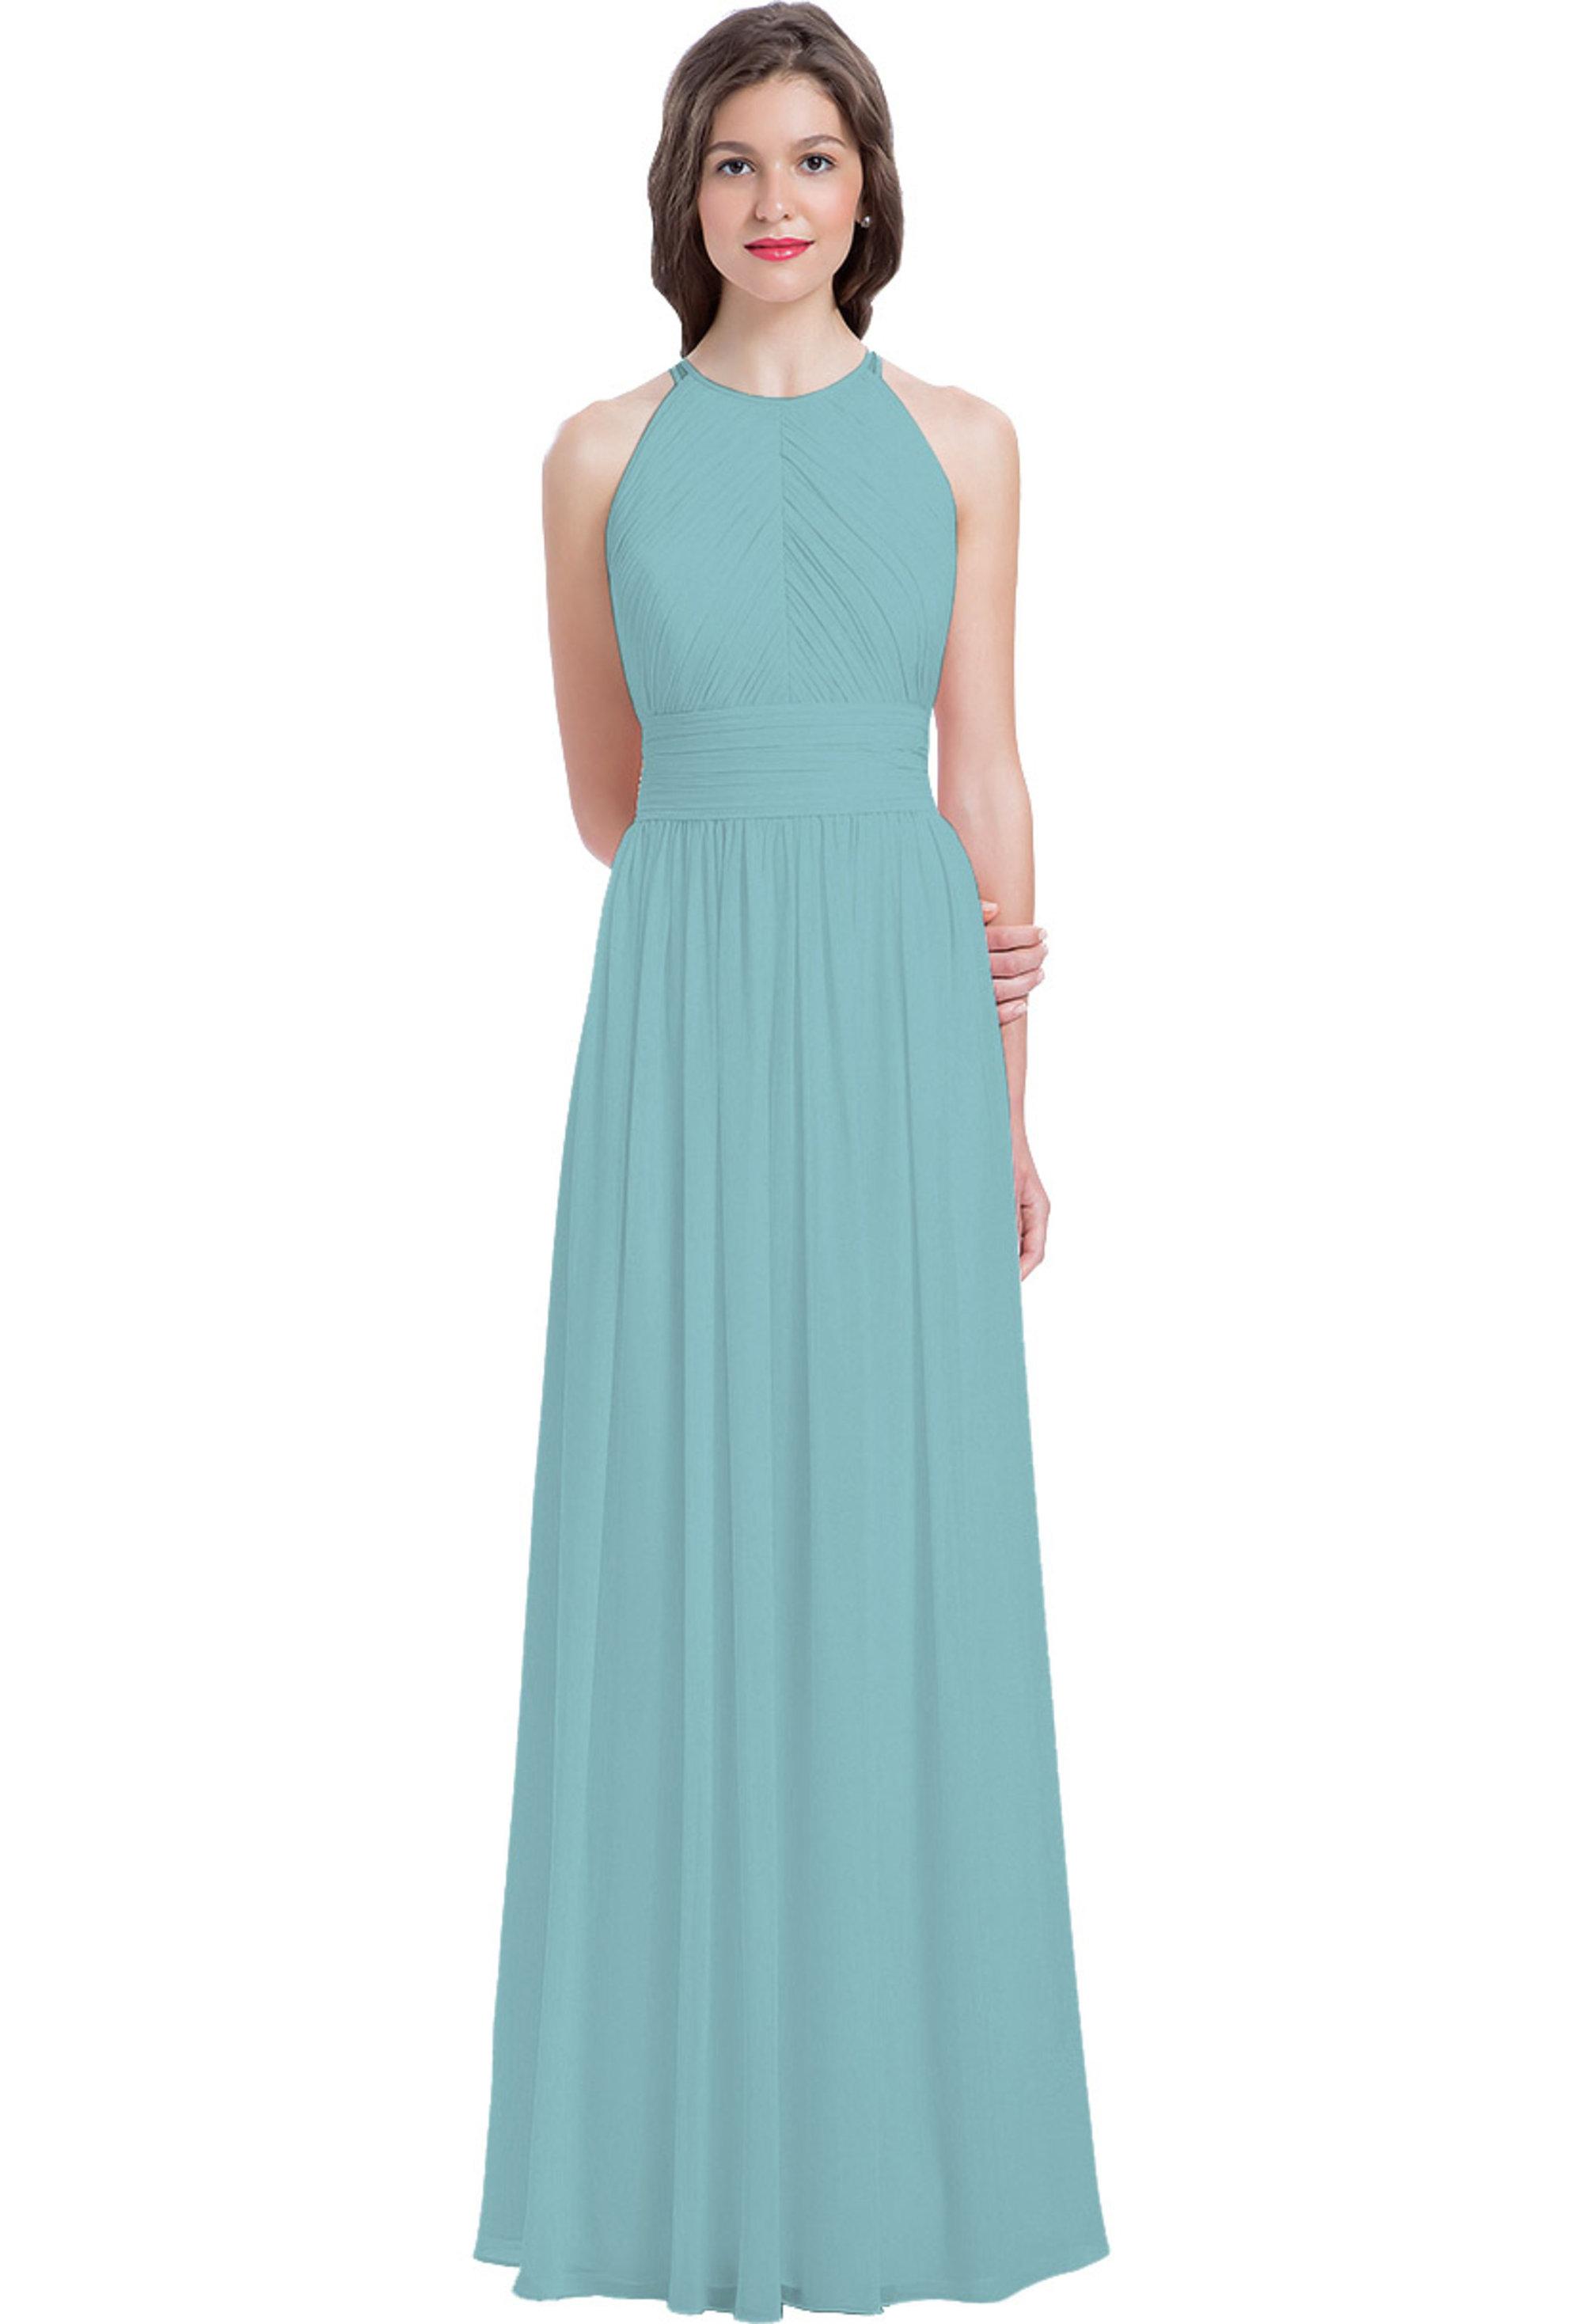 Bill Levkoff GLACIER Chiffon Sleeveless A-line gown, $240.00 Front